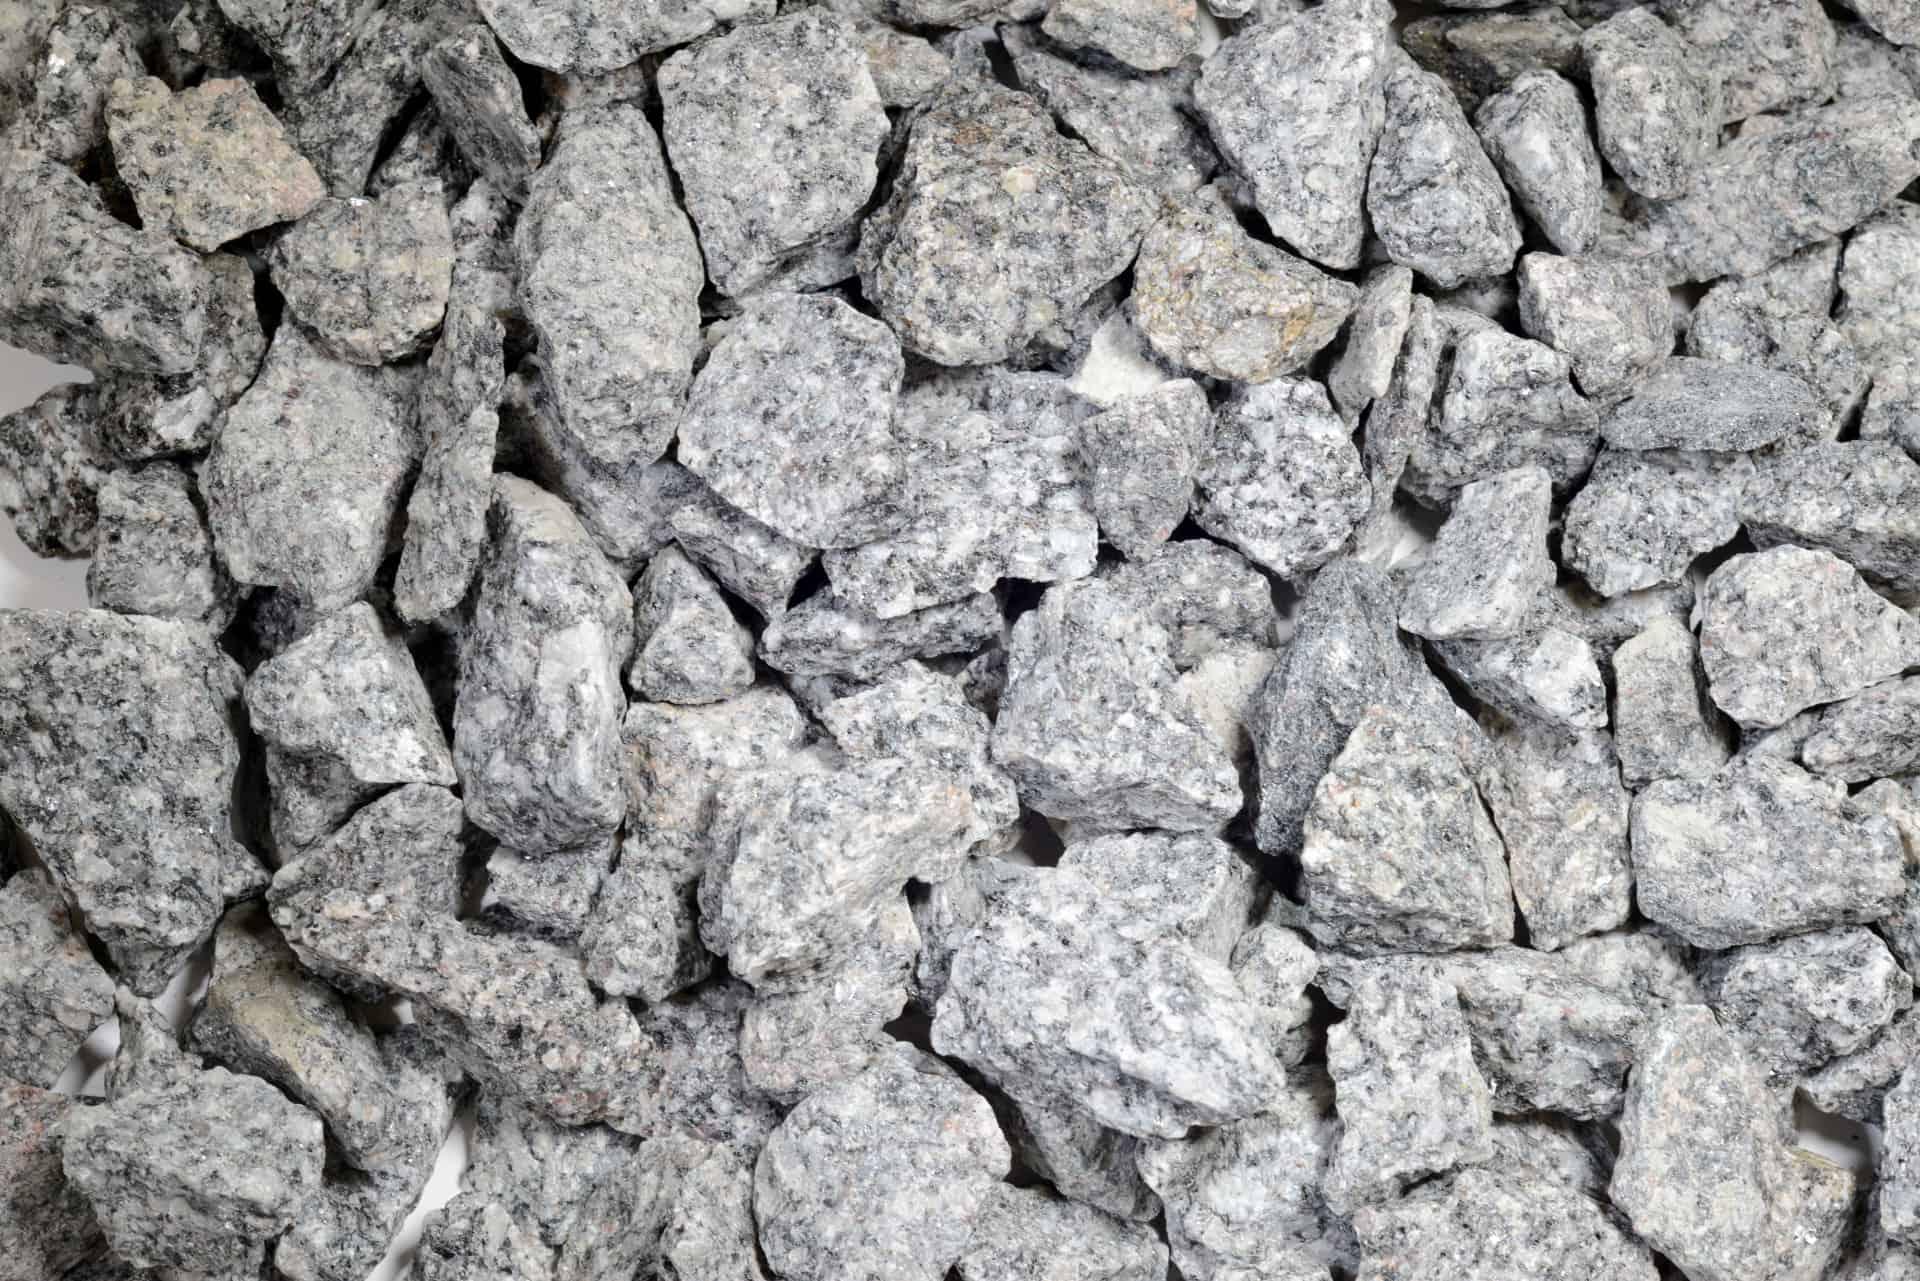 Granitsplitt grau 16-32mm - Sack vor Orth - Heidelberg